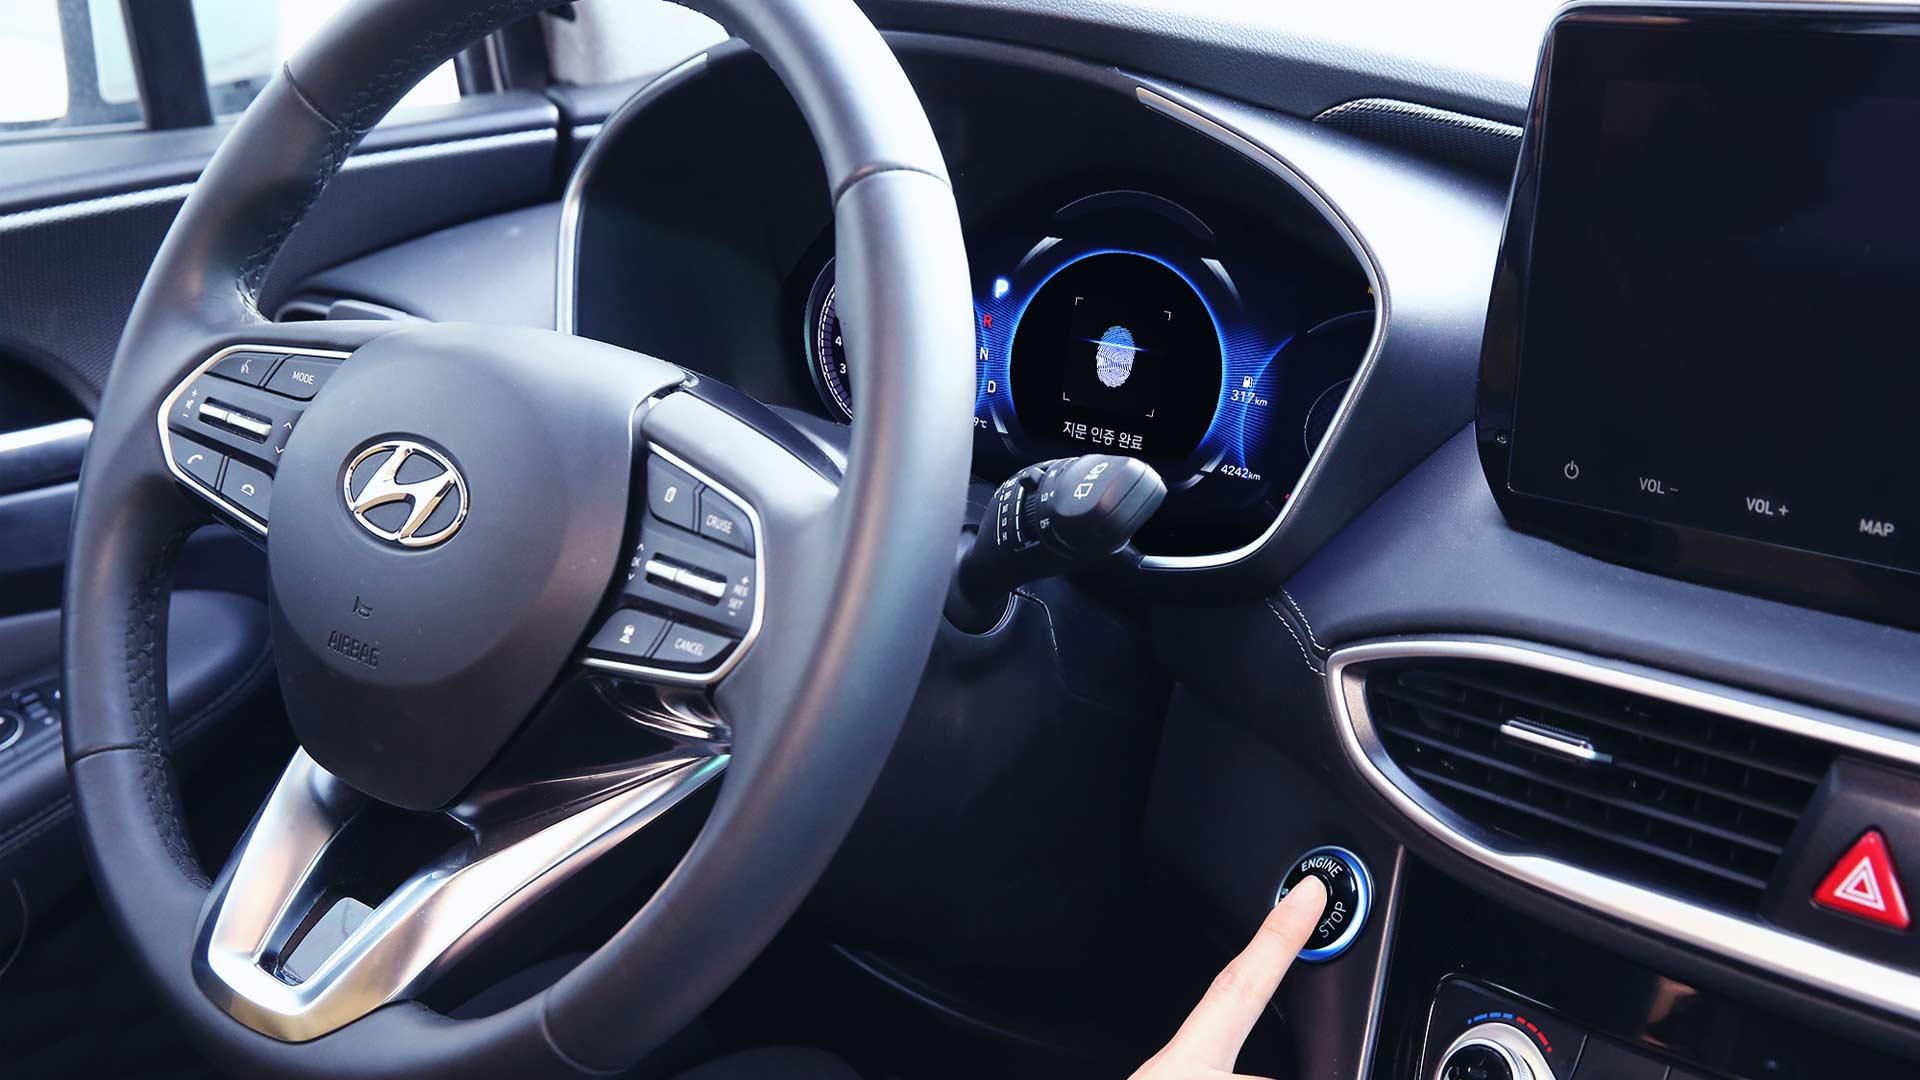 Hyundai-fingerprint-technology-vehicles